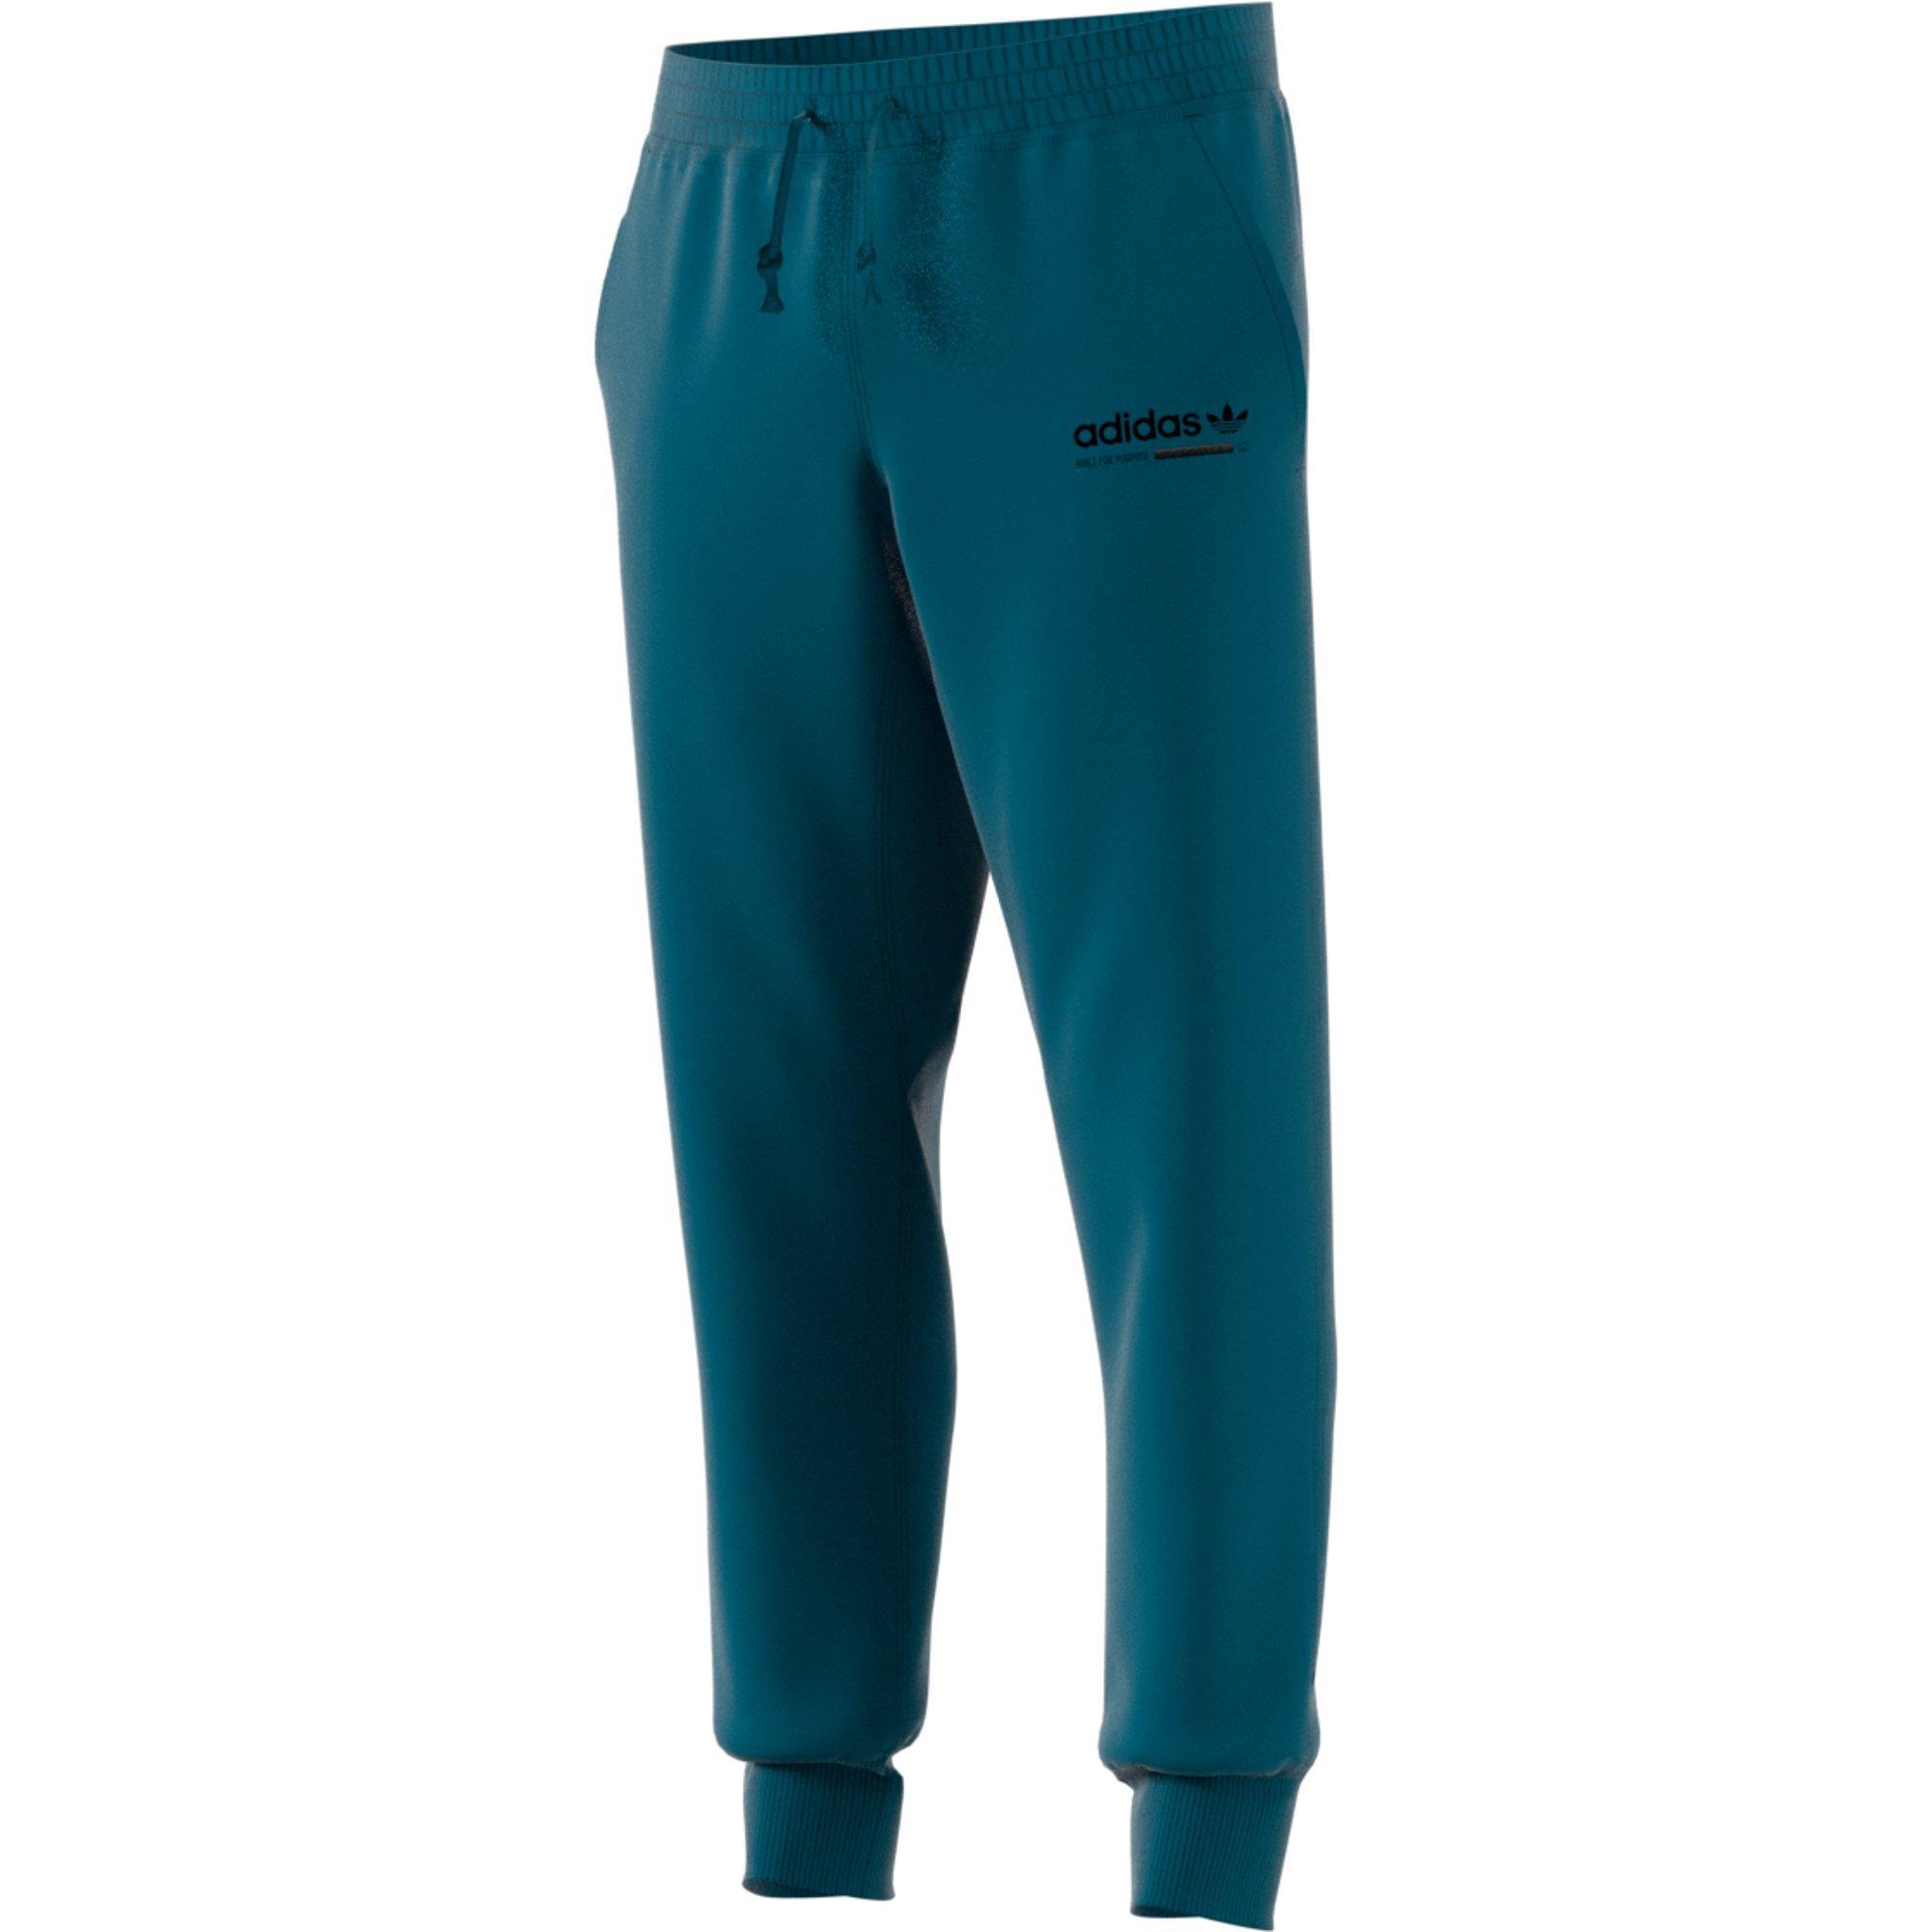 Adidas men   kaval sweatpants main container image also hibbett us rh